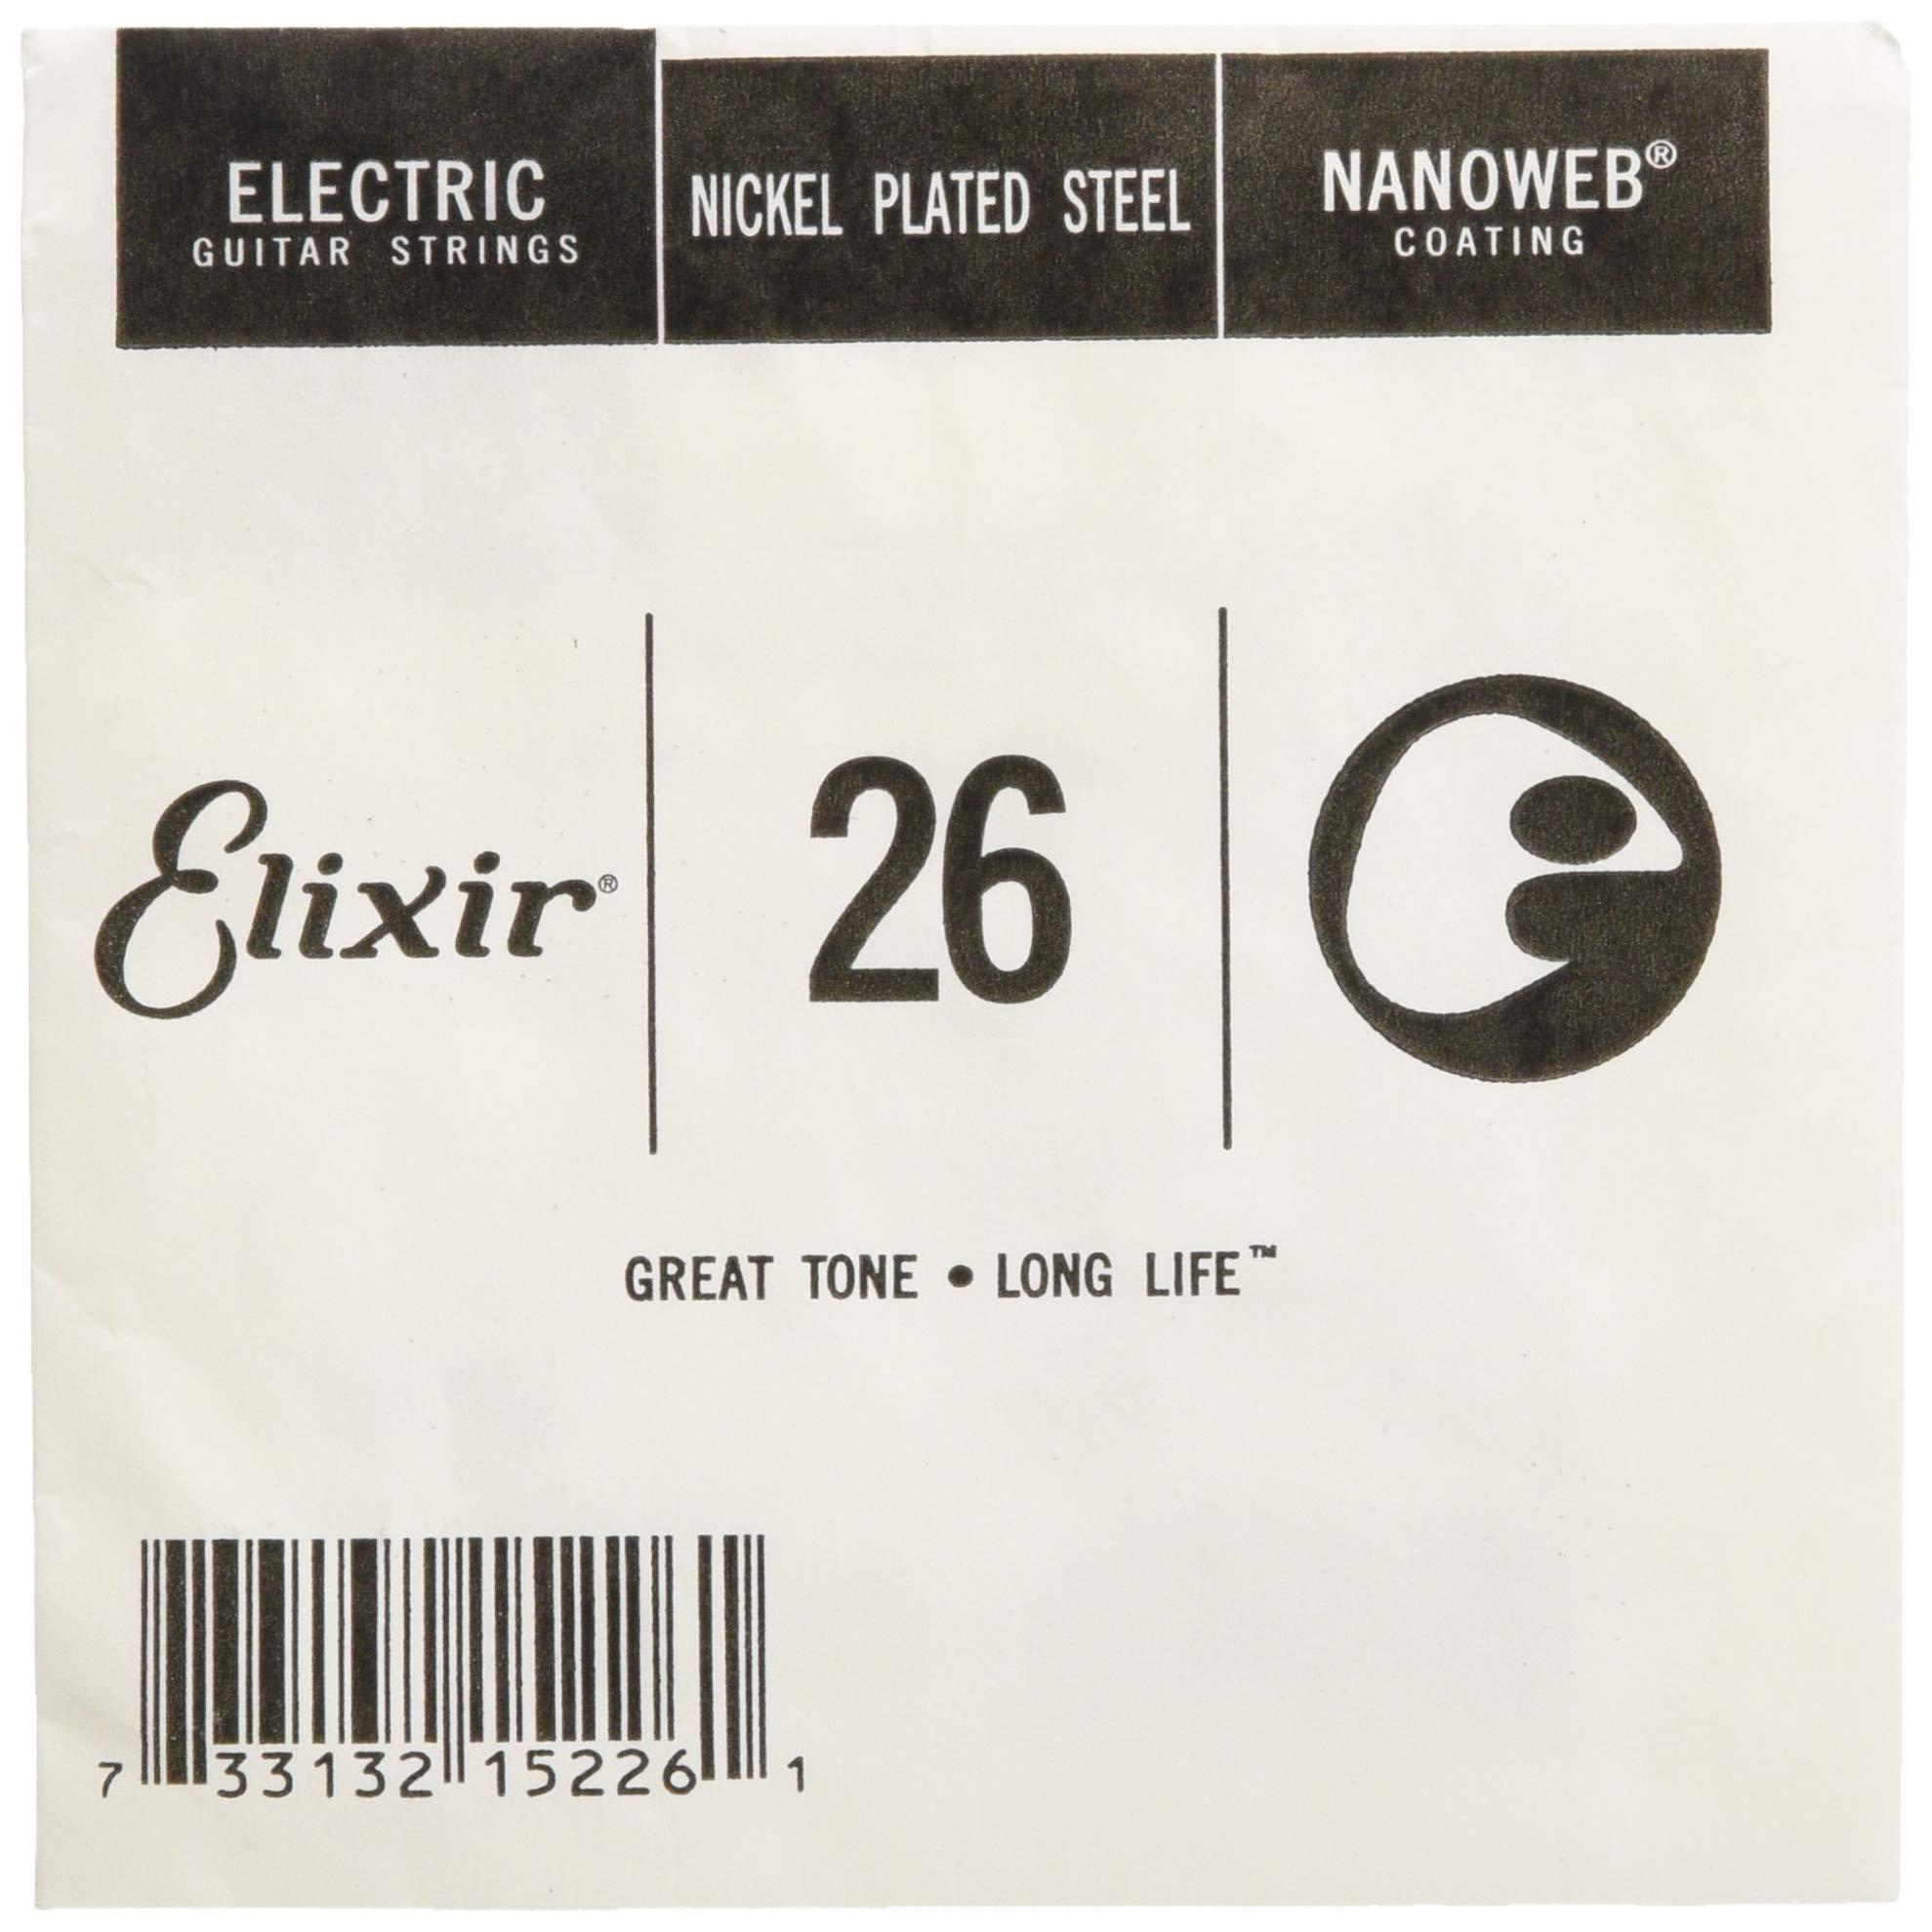 Cheap Elixir Strings Electric Guitar String NANOWEB Coating .026 Black Friday & Cyber Monday 2019